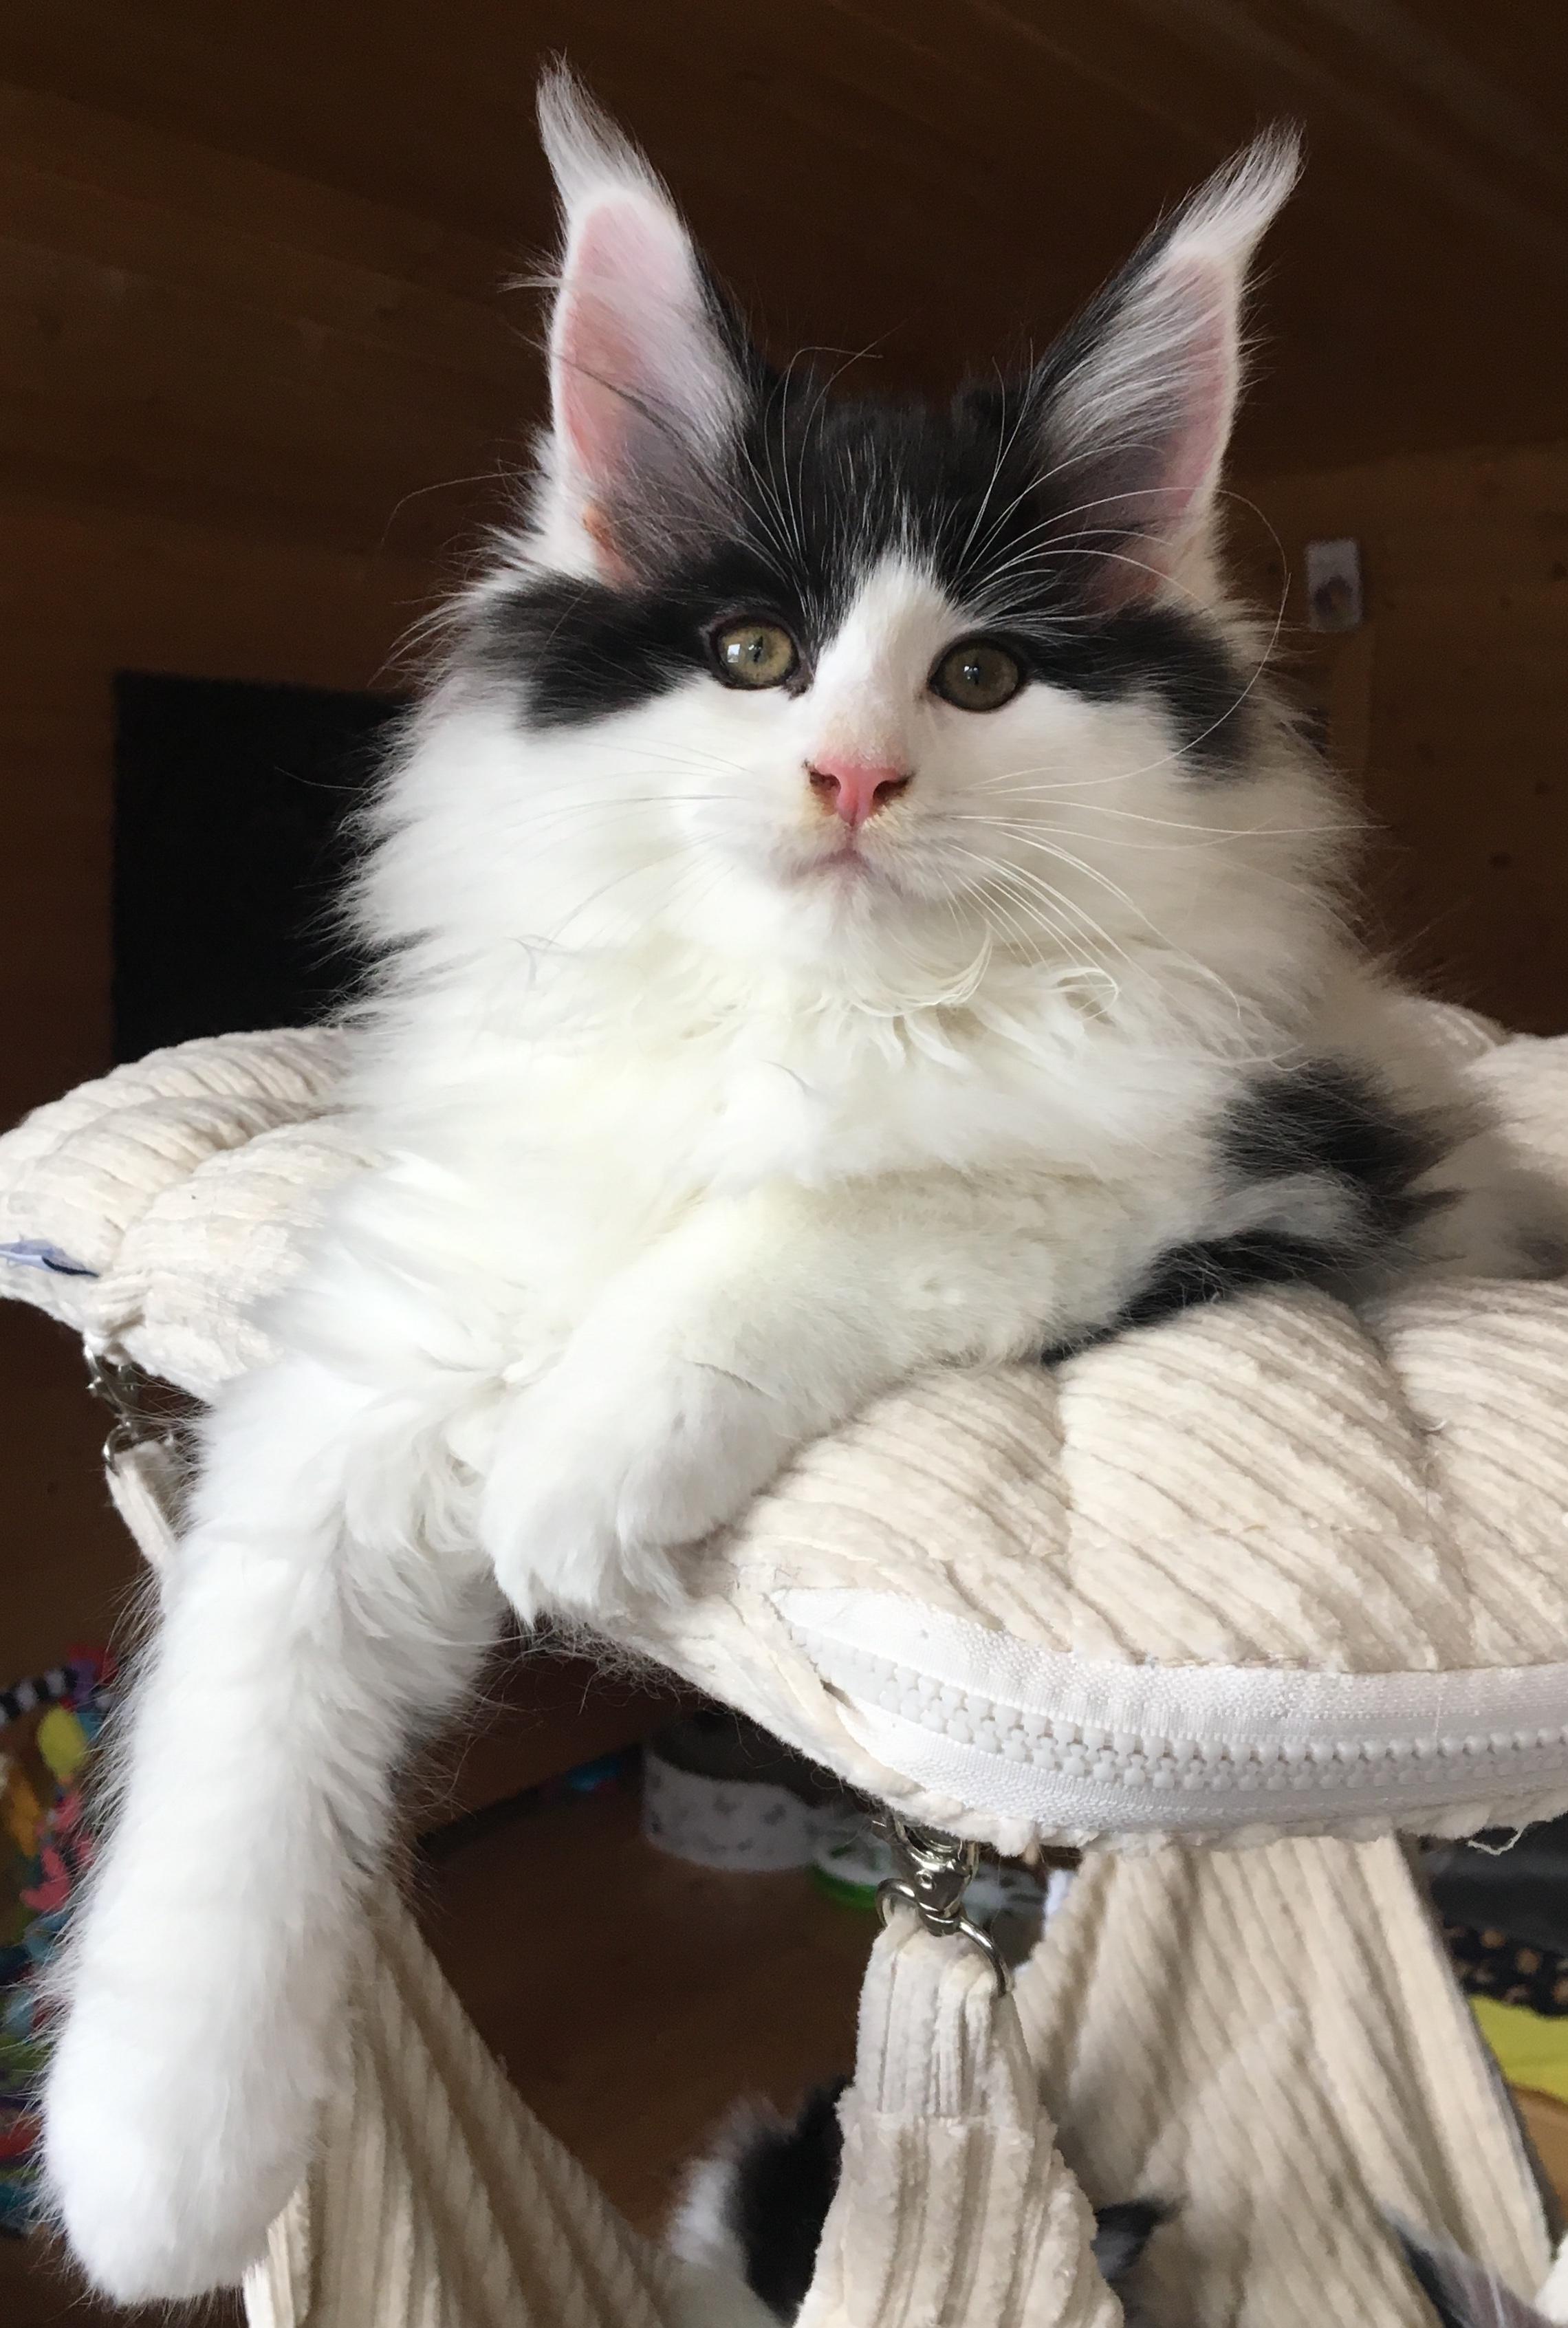 fotka kočky VRH E: ELLEGÁN von ERILLIAN*CZ 👦🏻